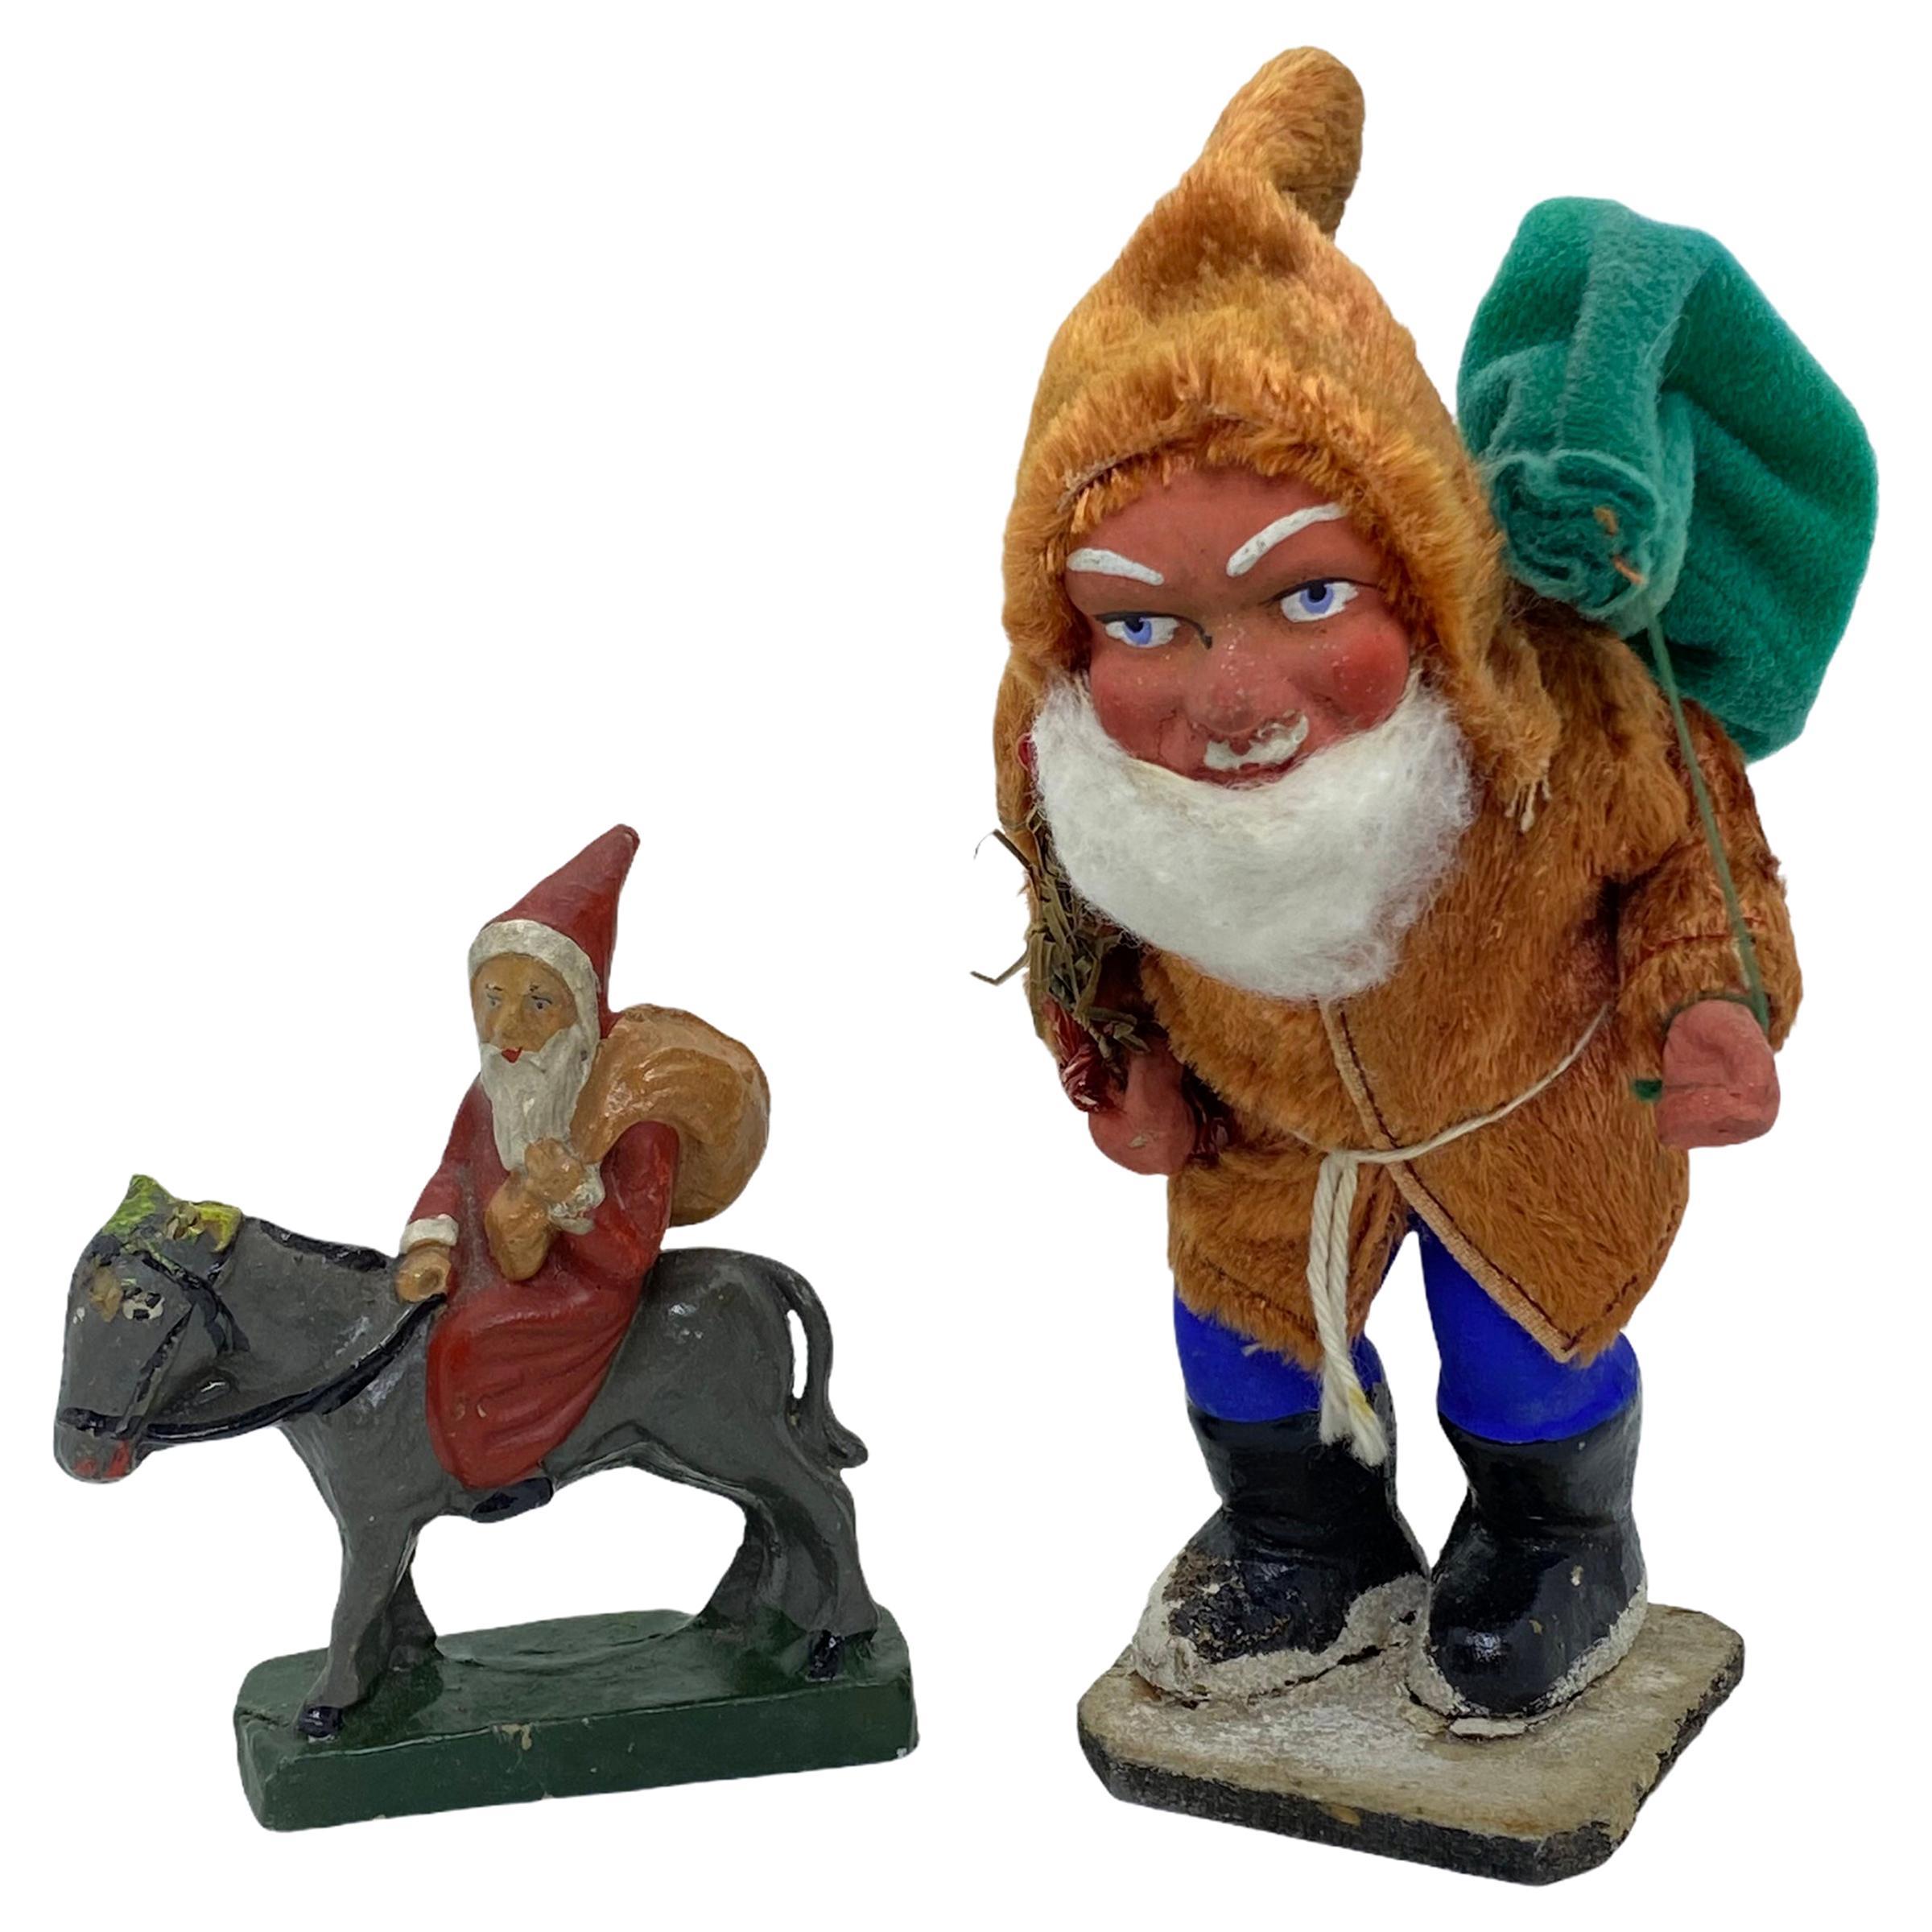 Two Santa Claus Figures Antique German Christmas, 1920s